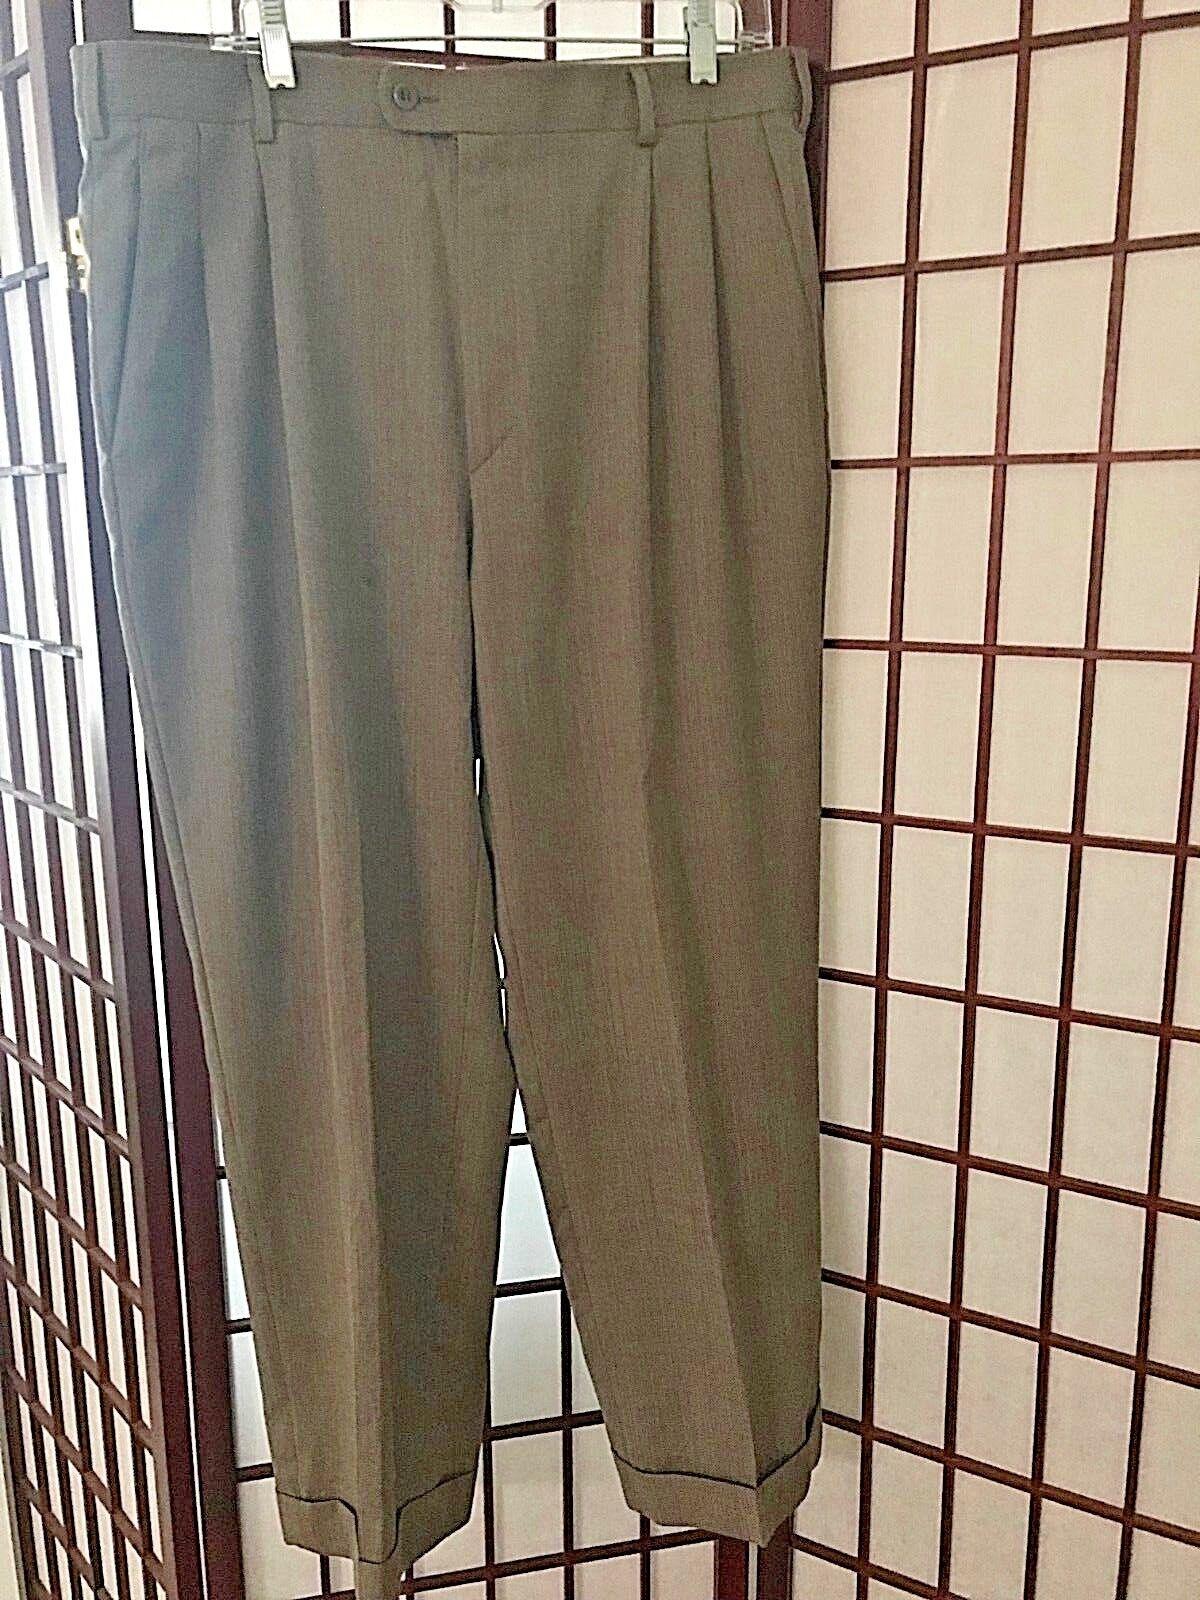 Zanella BENNETT Wool Dress Pant 36 x 32  BROWN